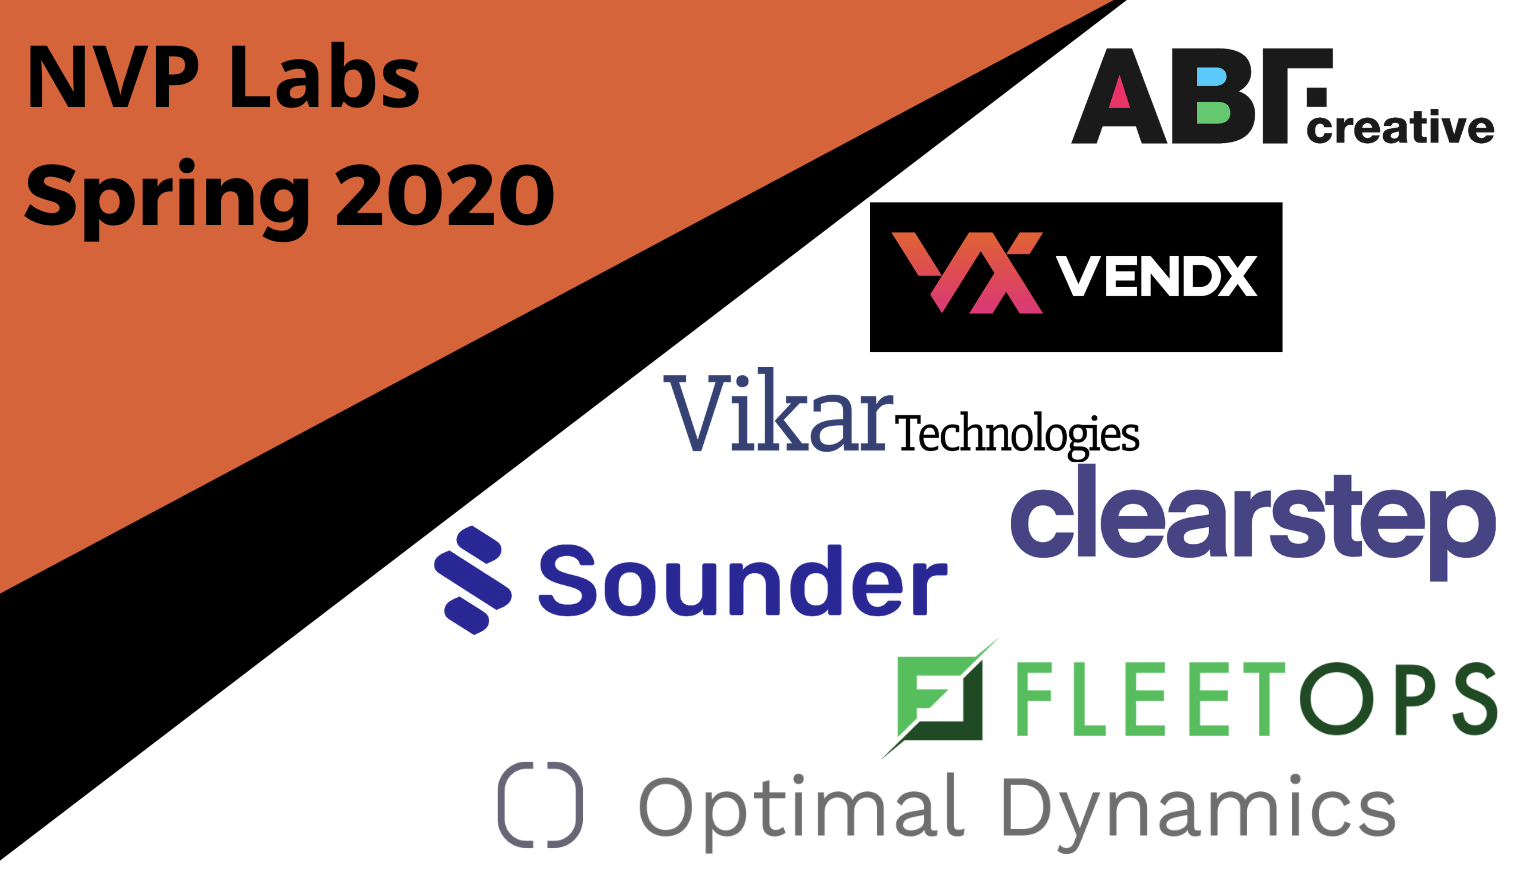 NVP Labs Spring 2020